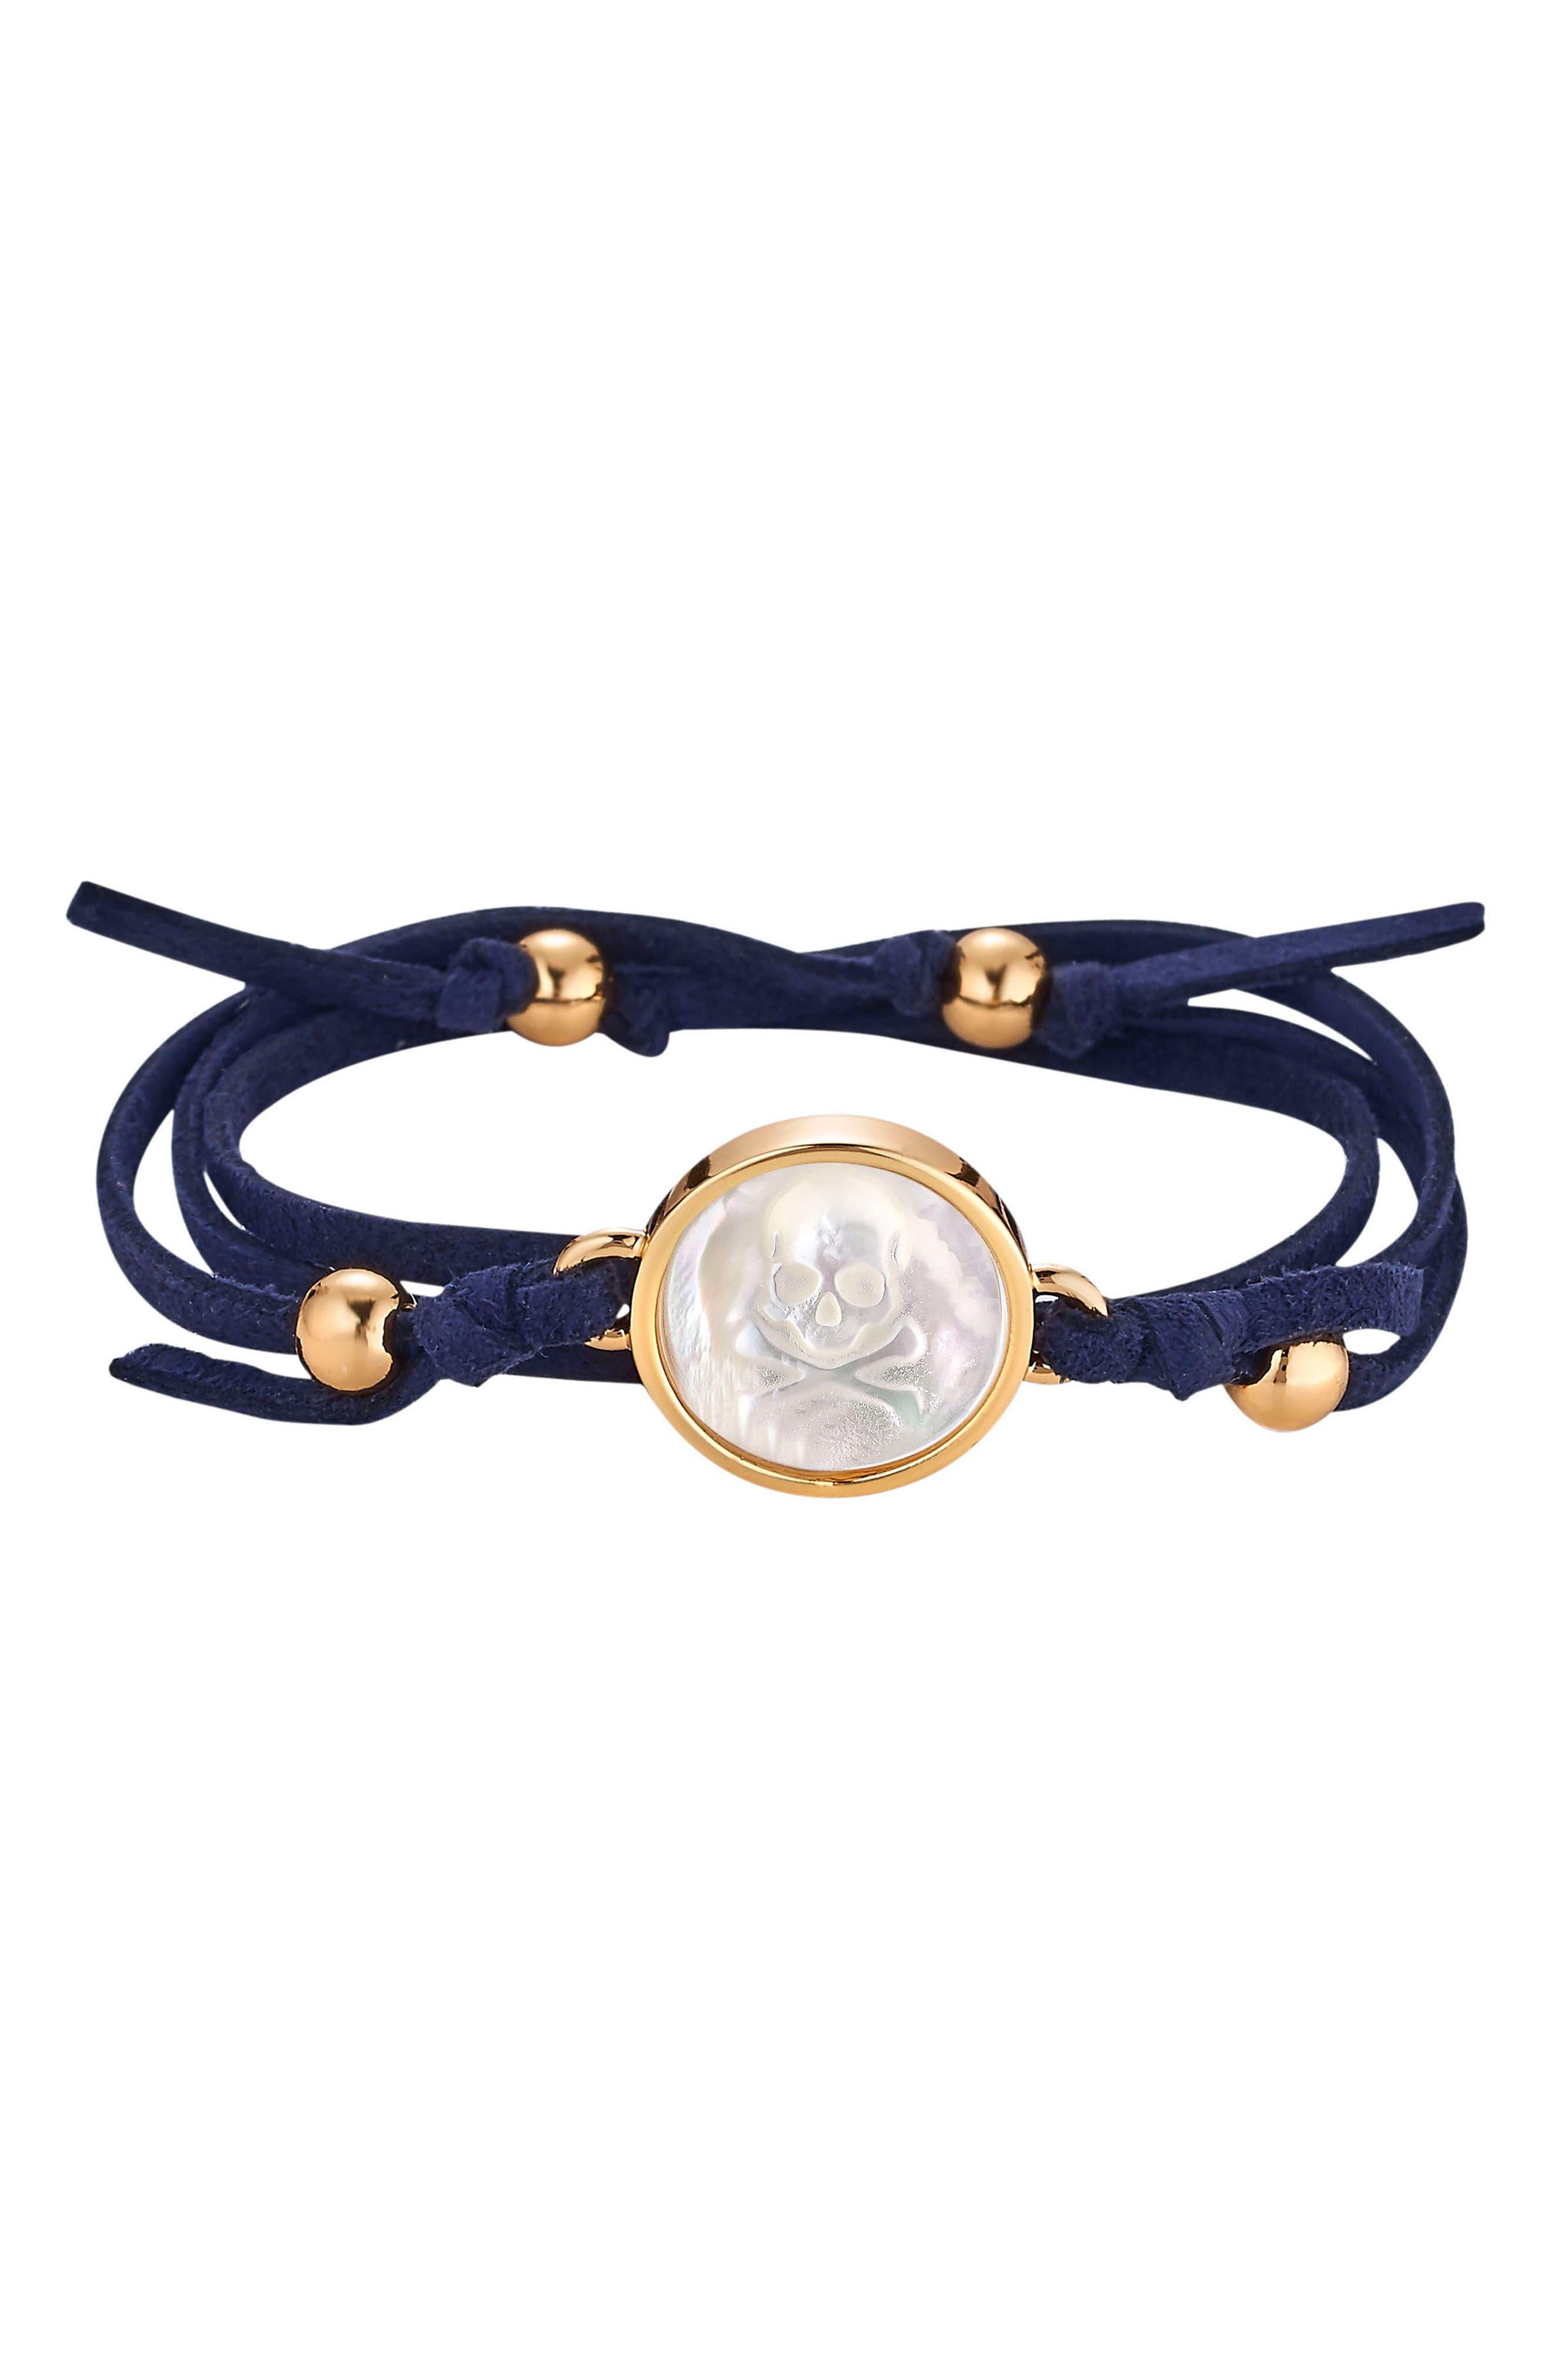 Skull & Bones Suede Wrap Bracelet,                             Main thumbnail 1, color,                             NAVY BLUE SKULL